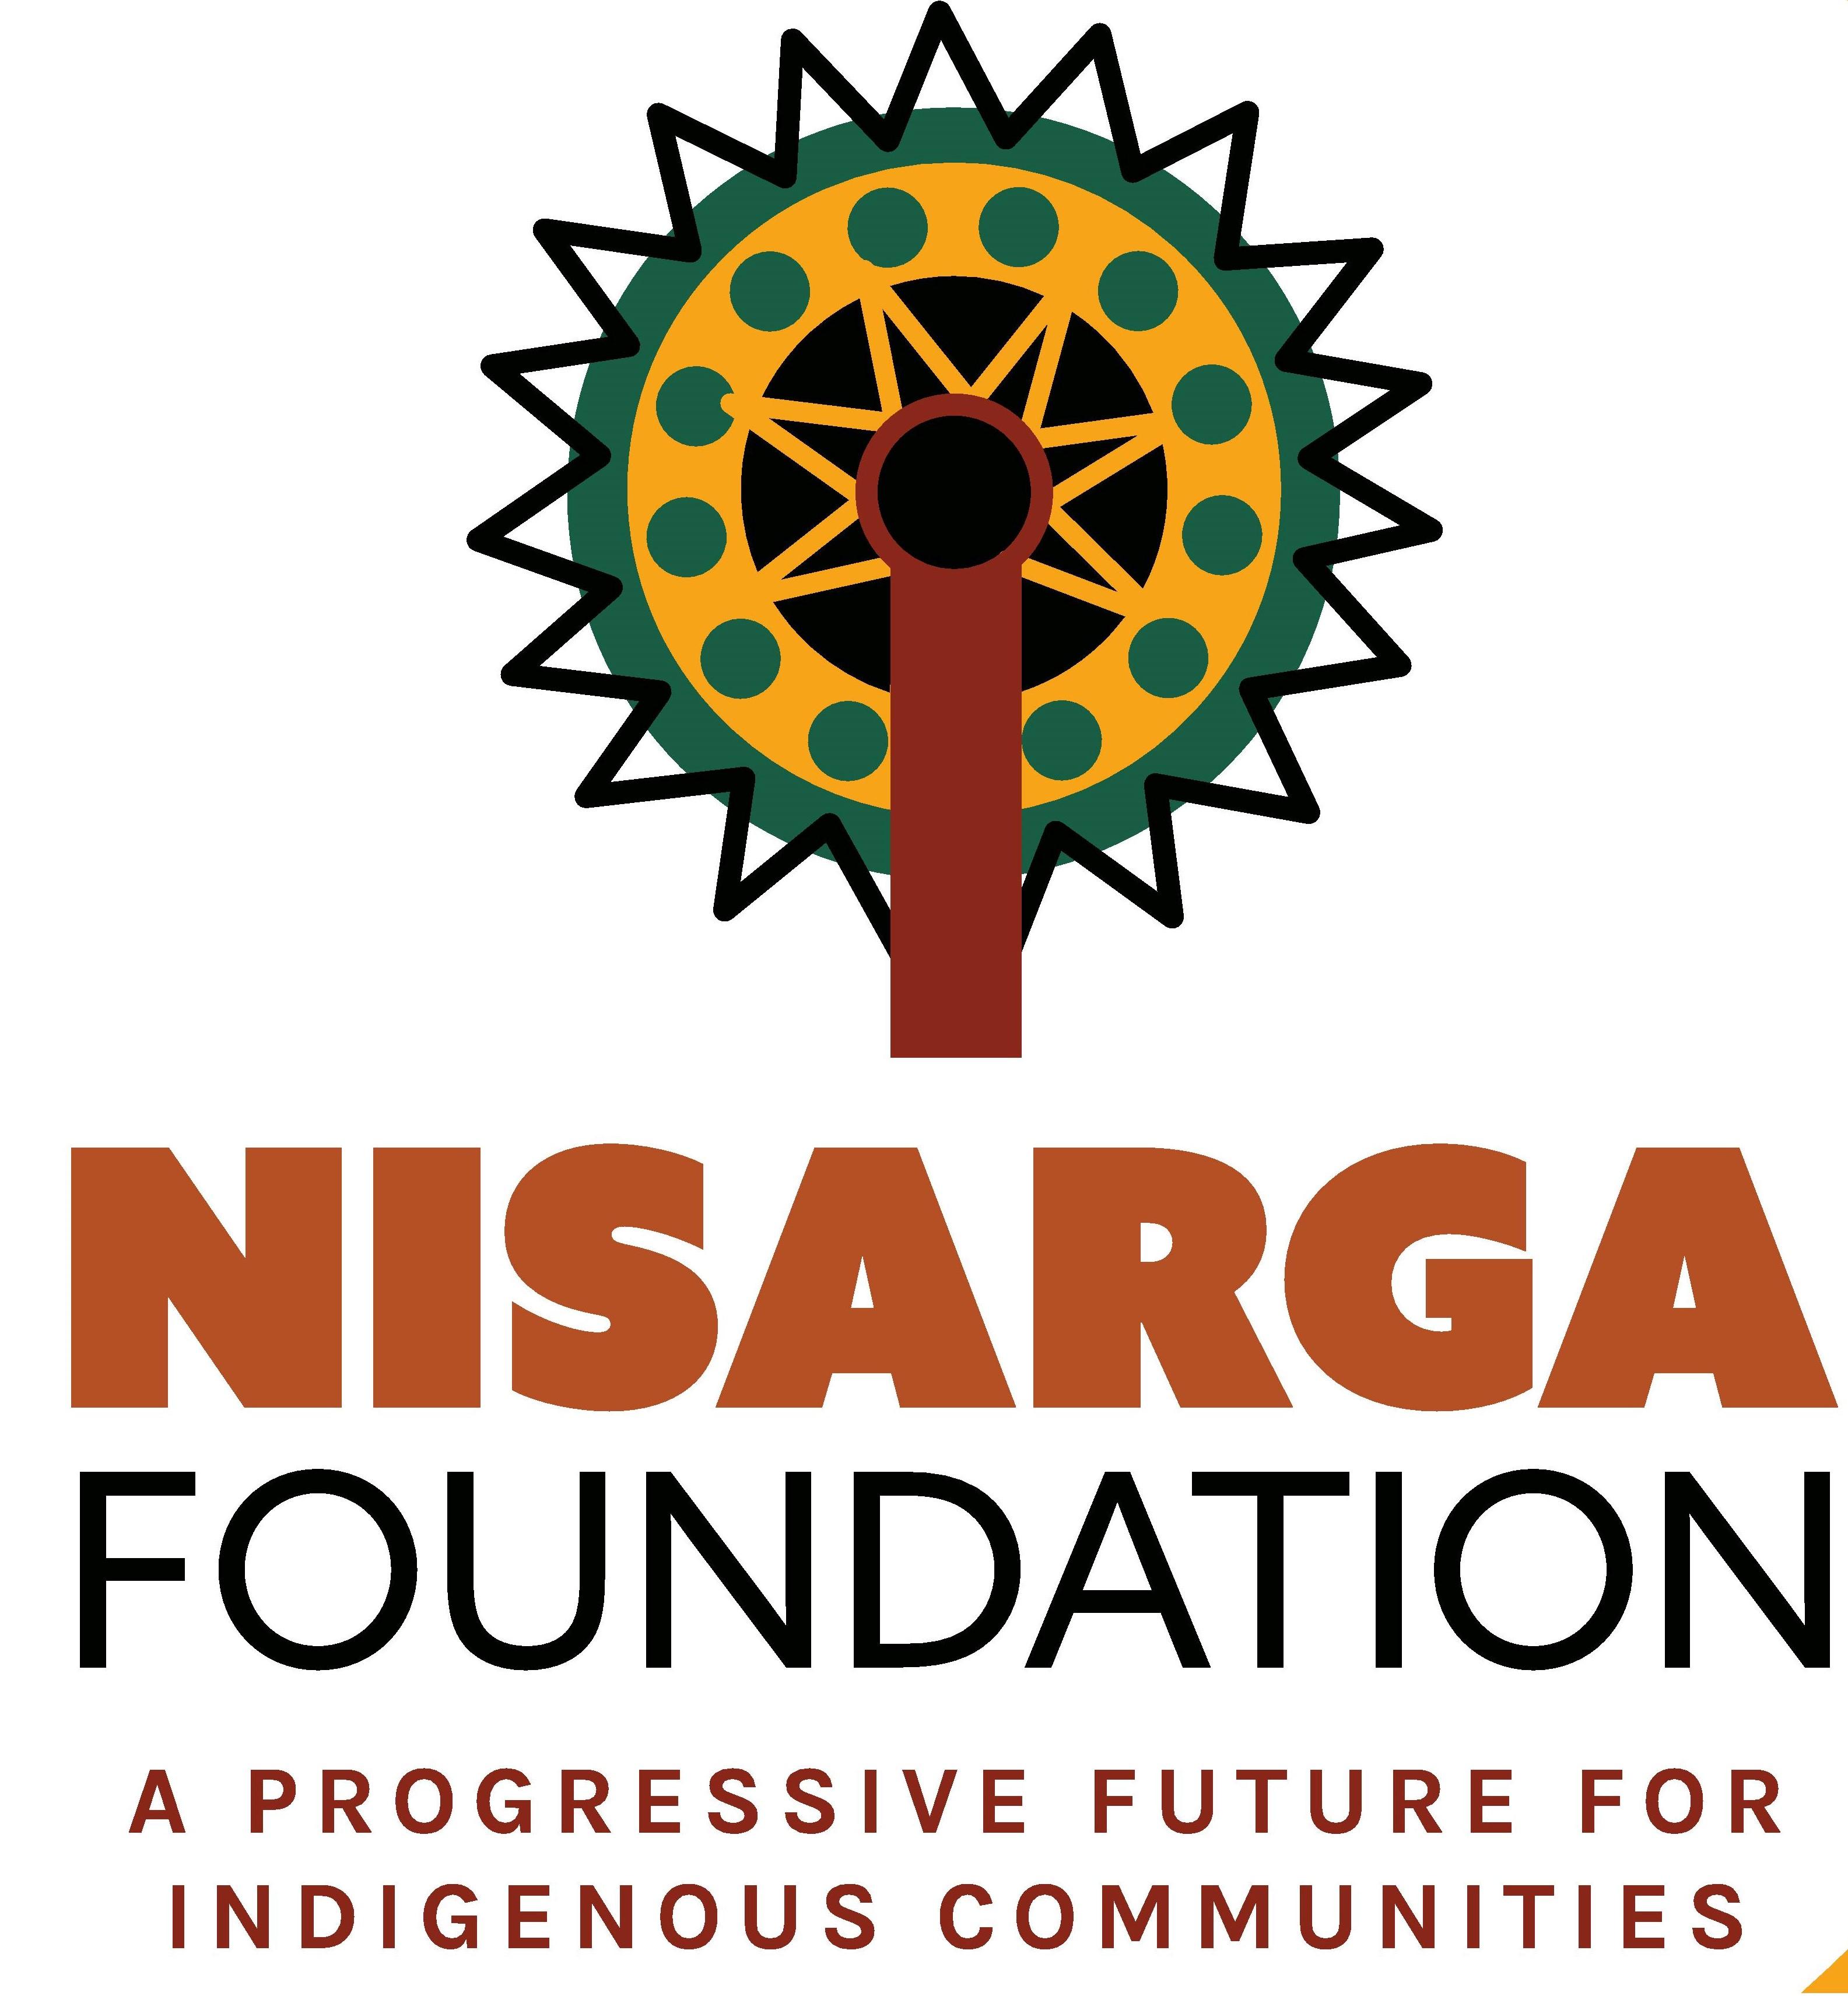 /media/nisarga/Nisarga_new_logo.jpg